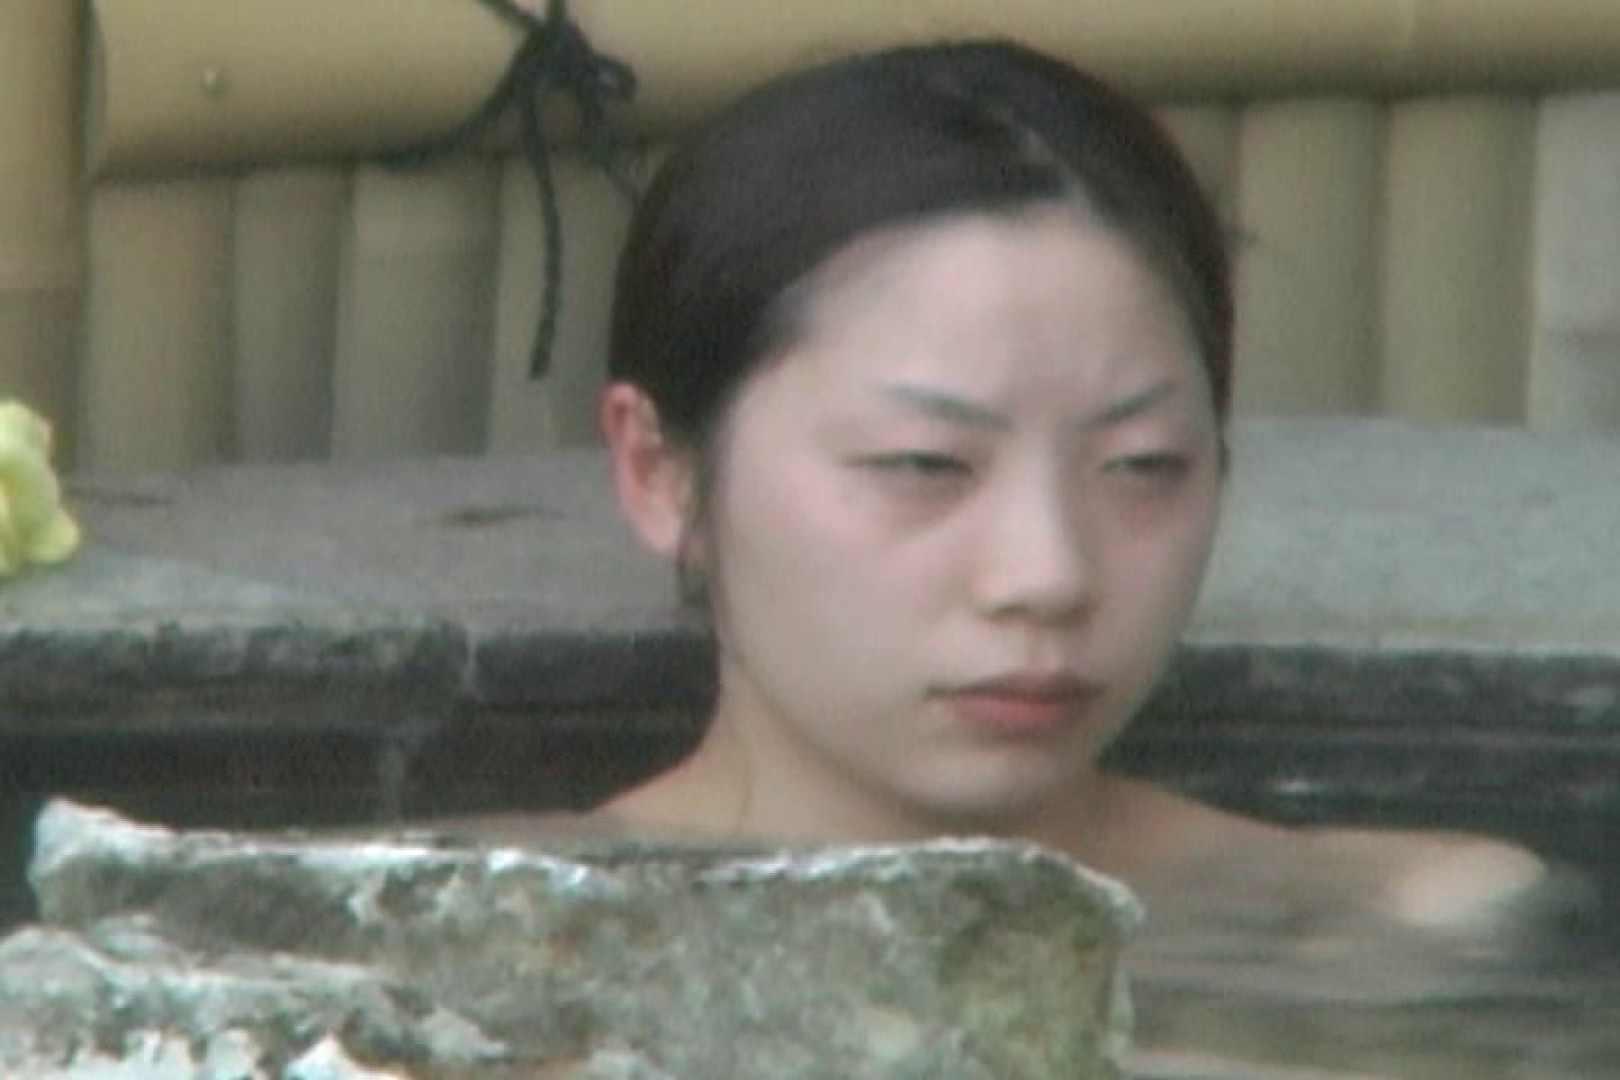 Aquaな露天風呂Vol.596 盗撮シリーズ | 露天風呂編  113PIX 13